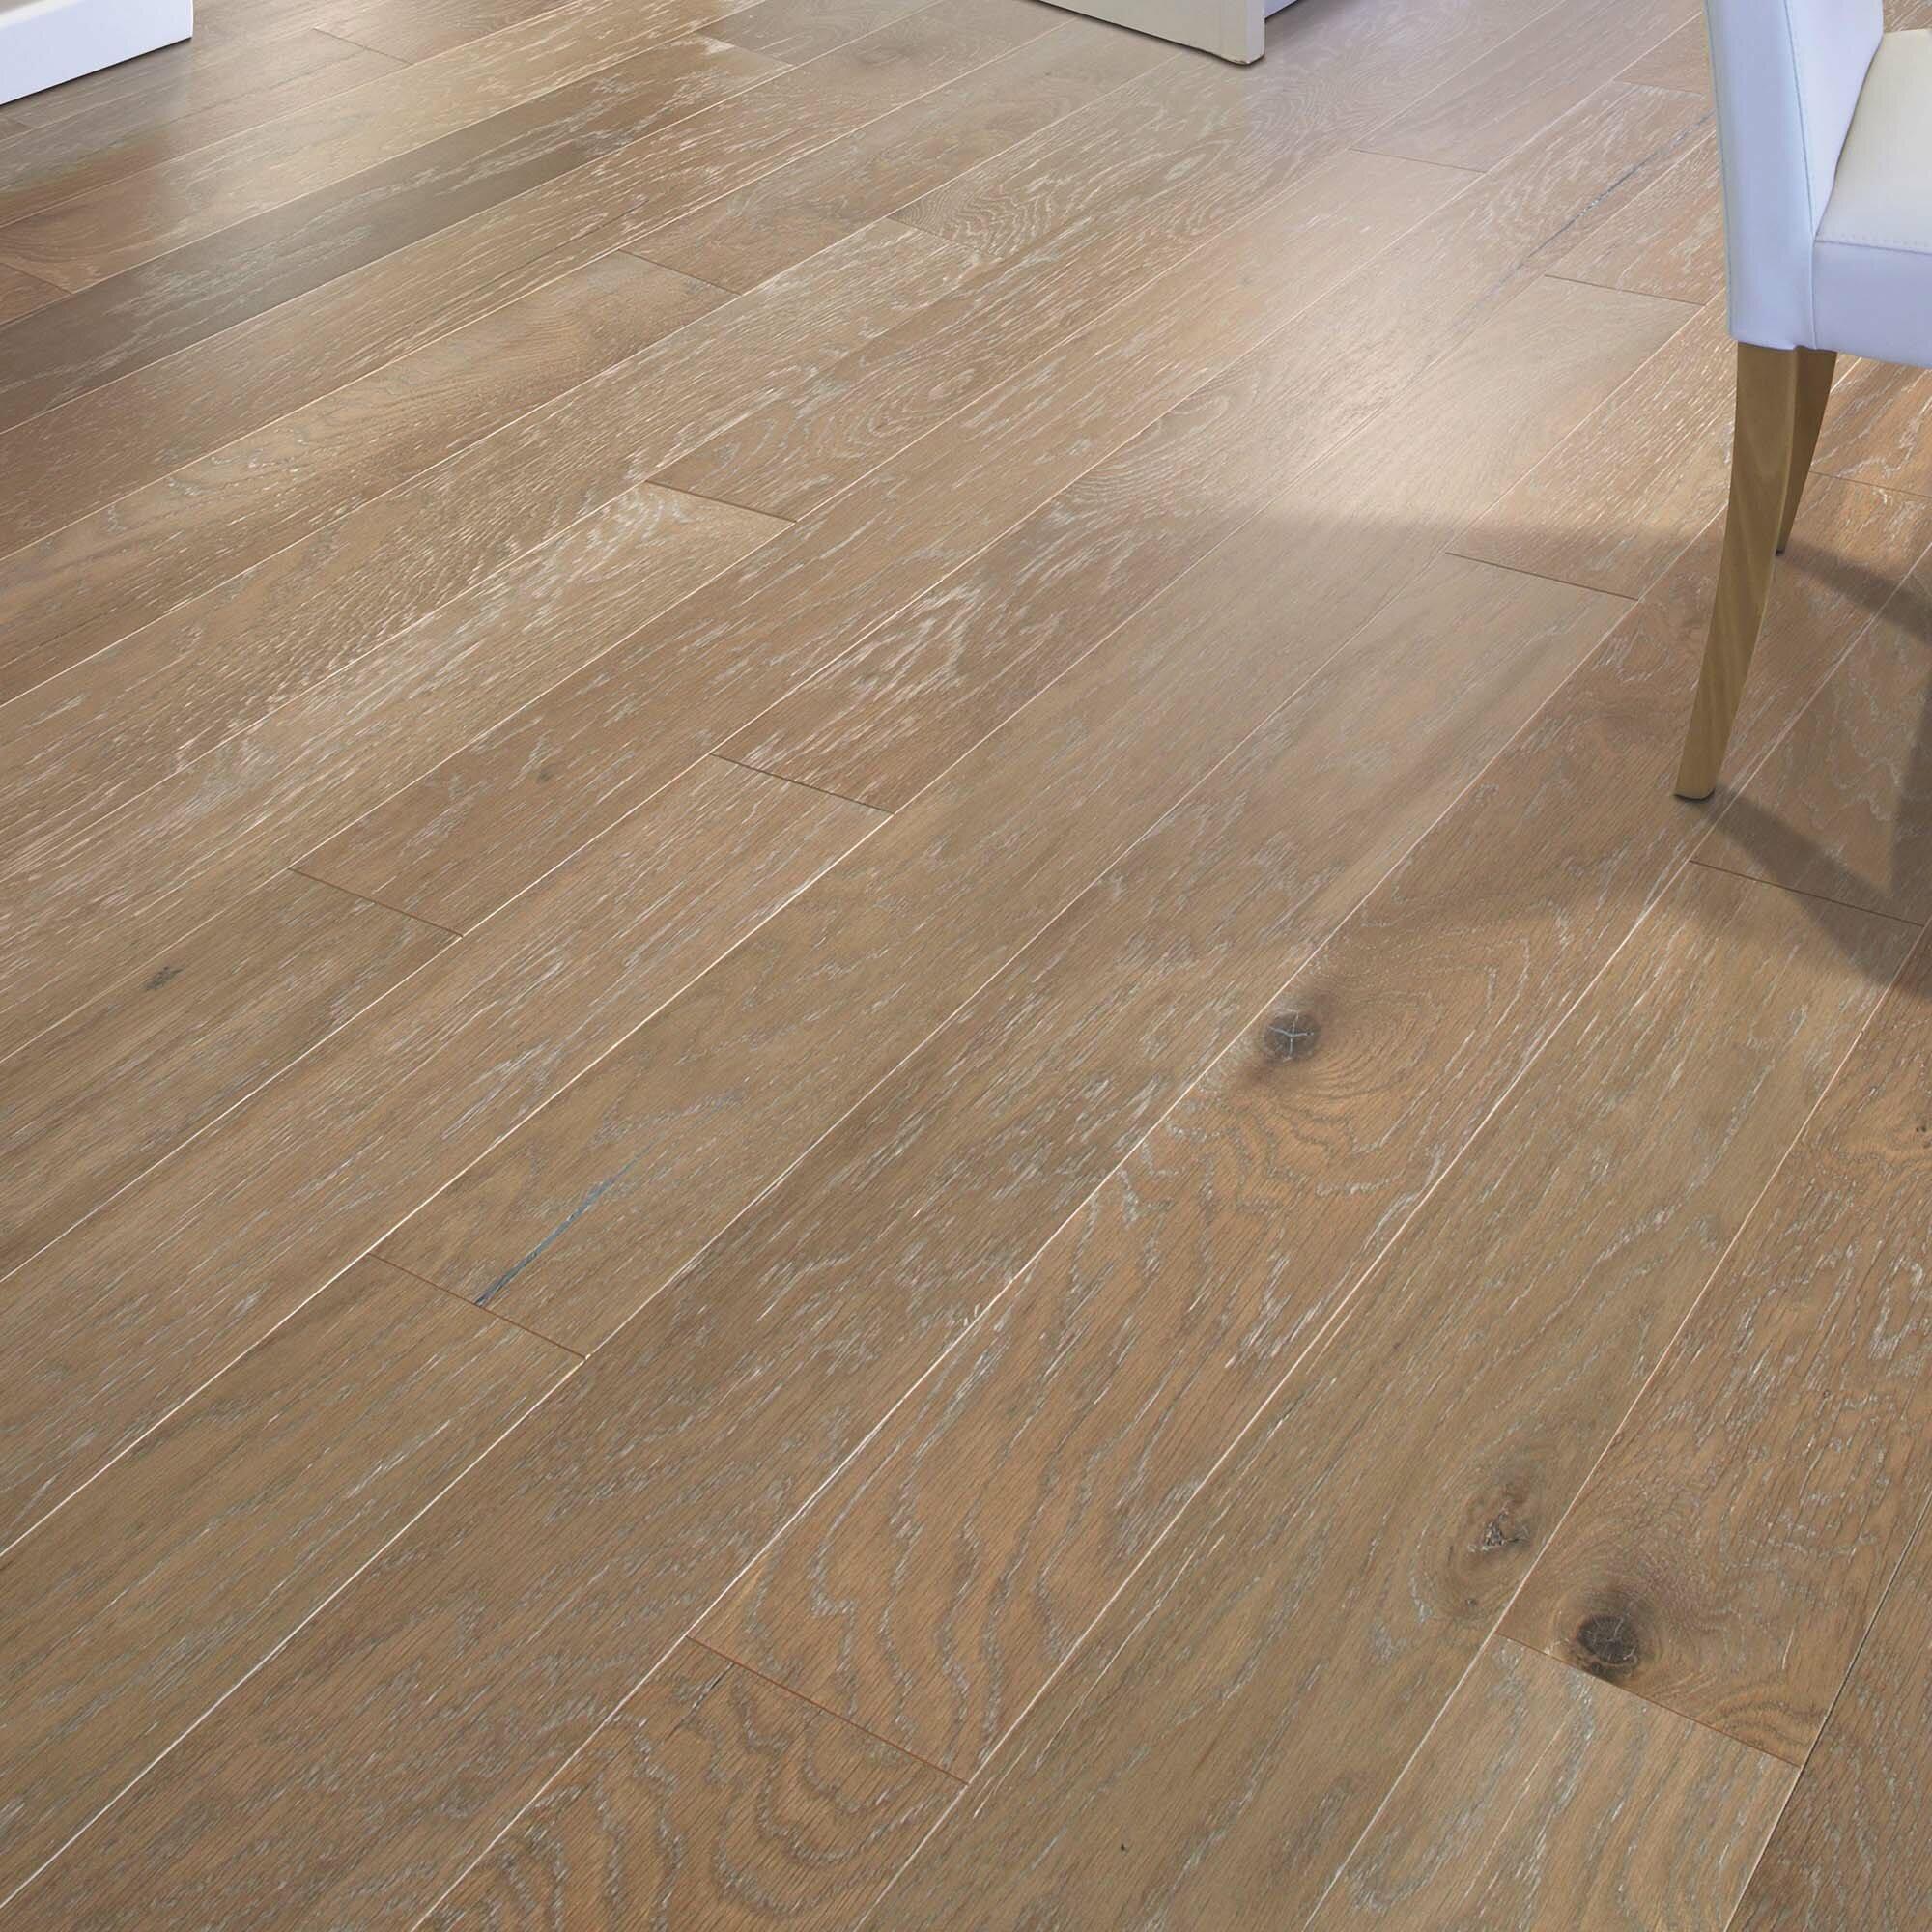 "American Villa Oak 5/5"" Thick x 5"" Wide x Varying Length Engineered  Hardwood Flooring"